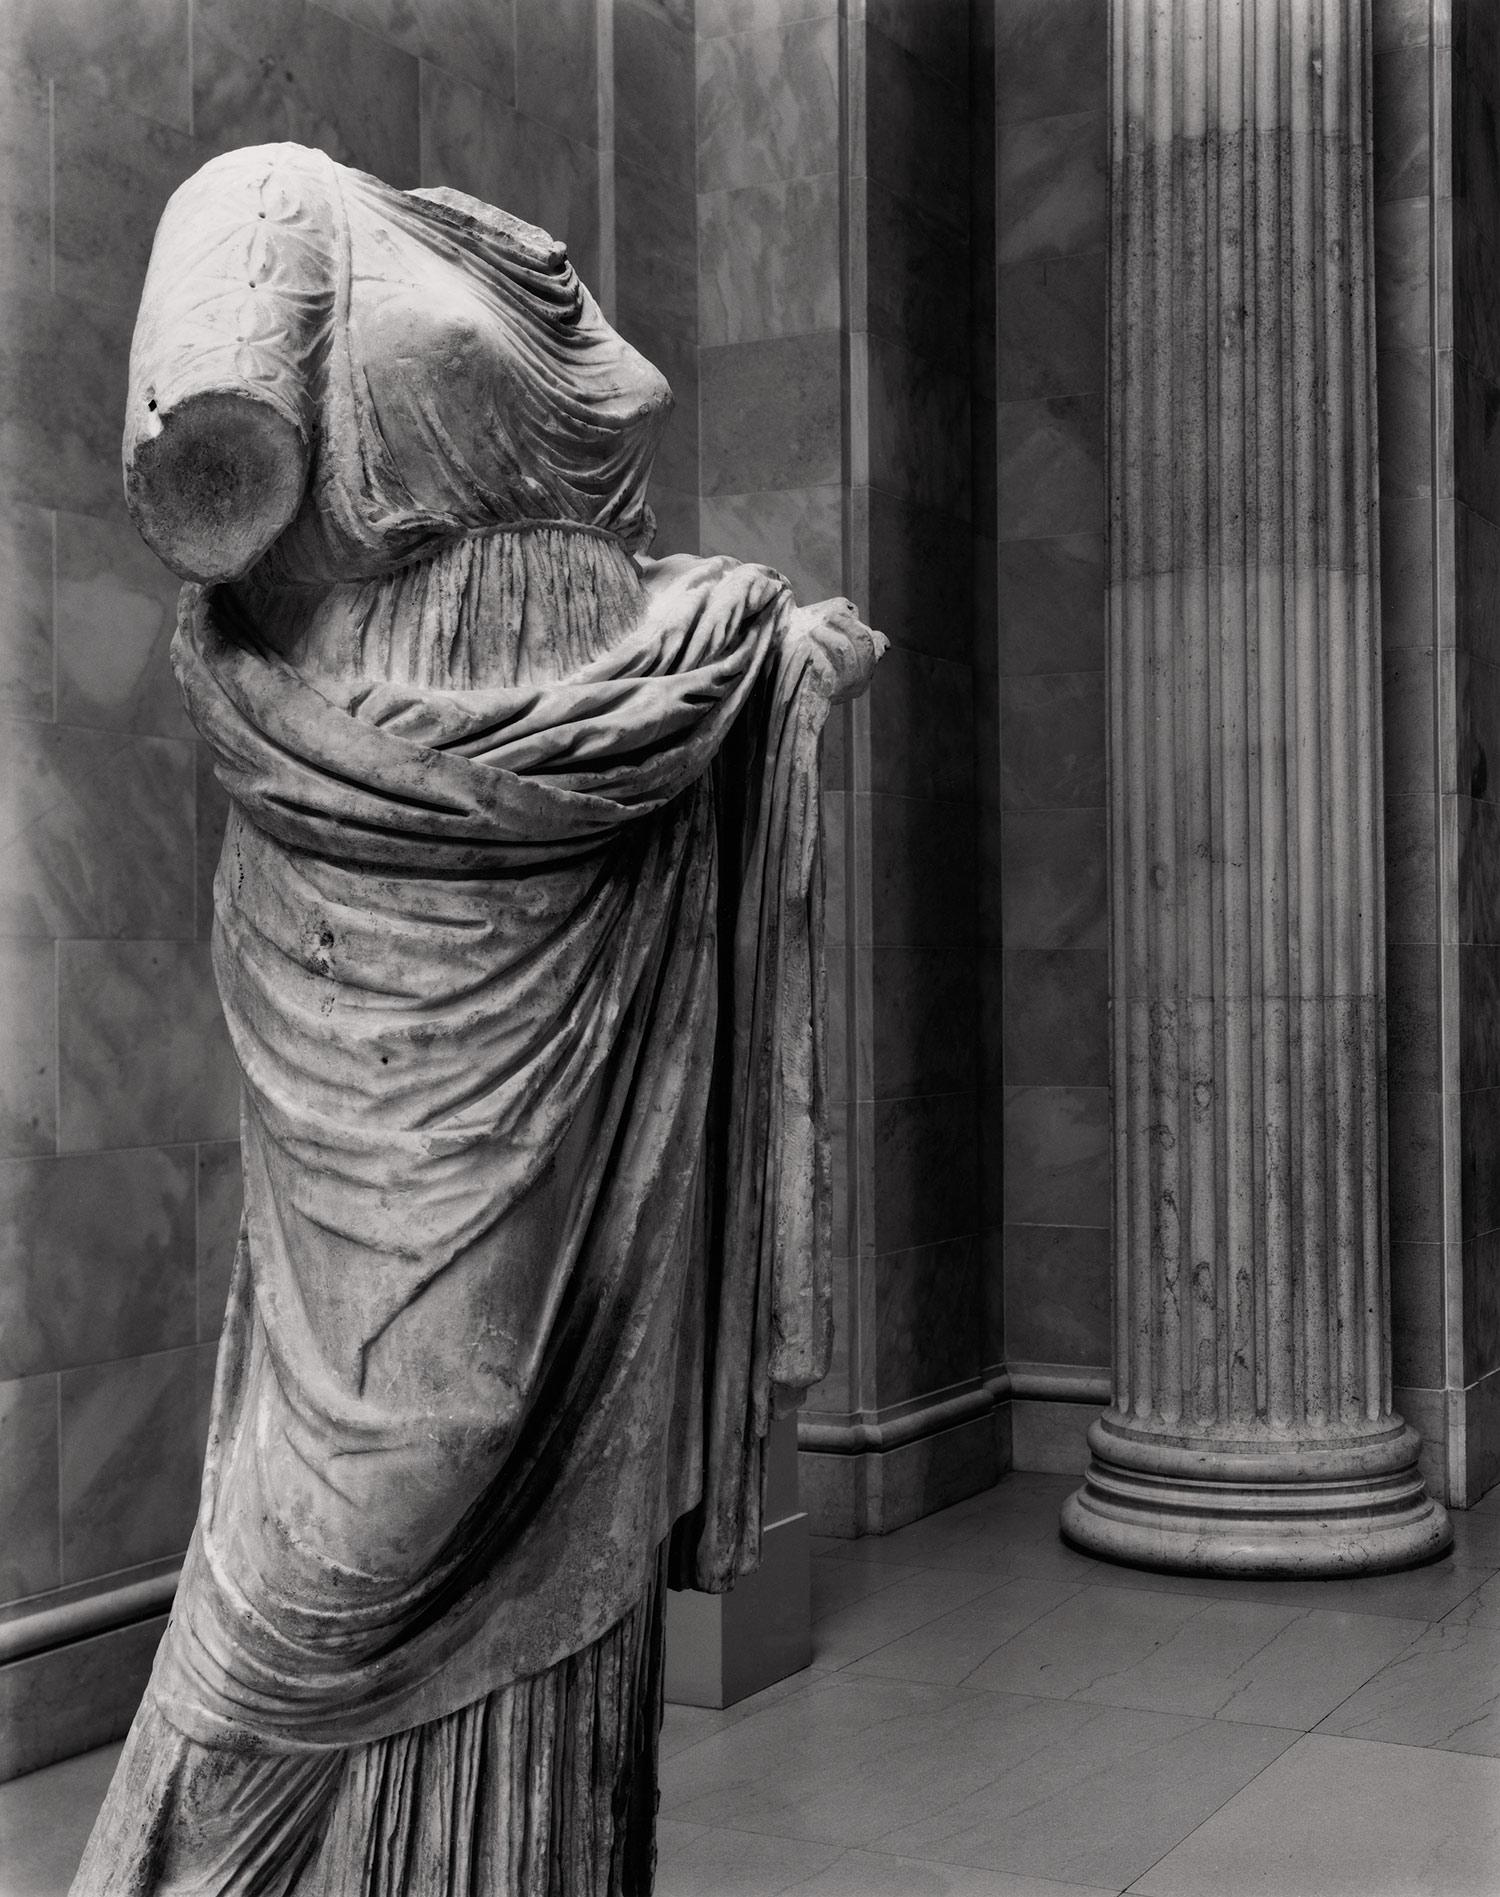 Greek Female Sculpture Statue of a woman